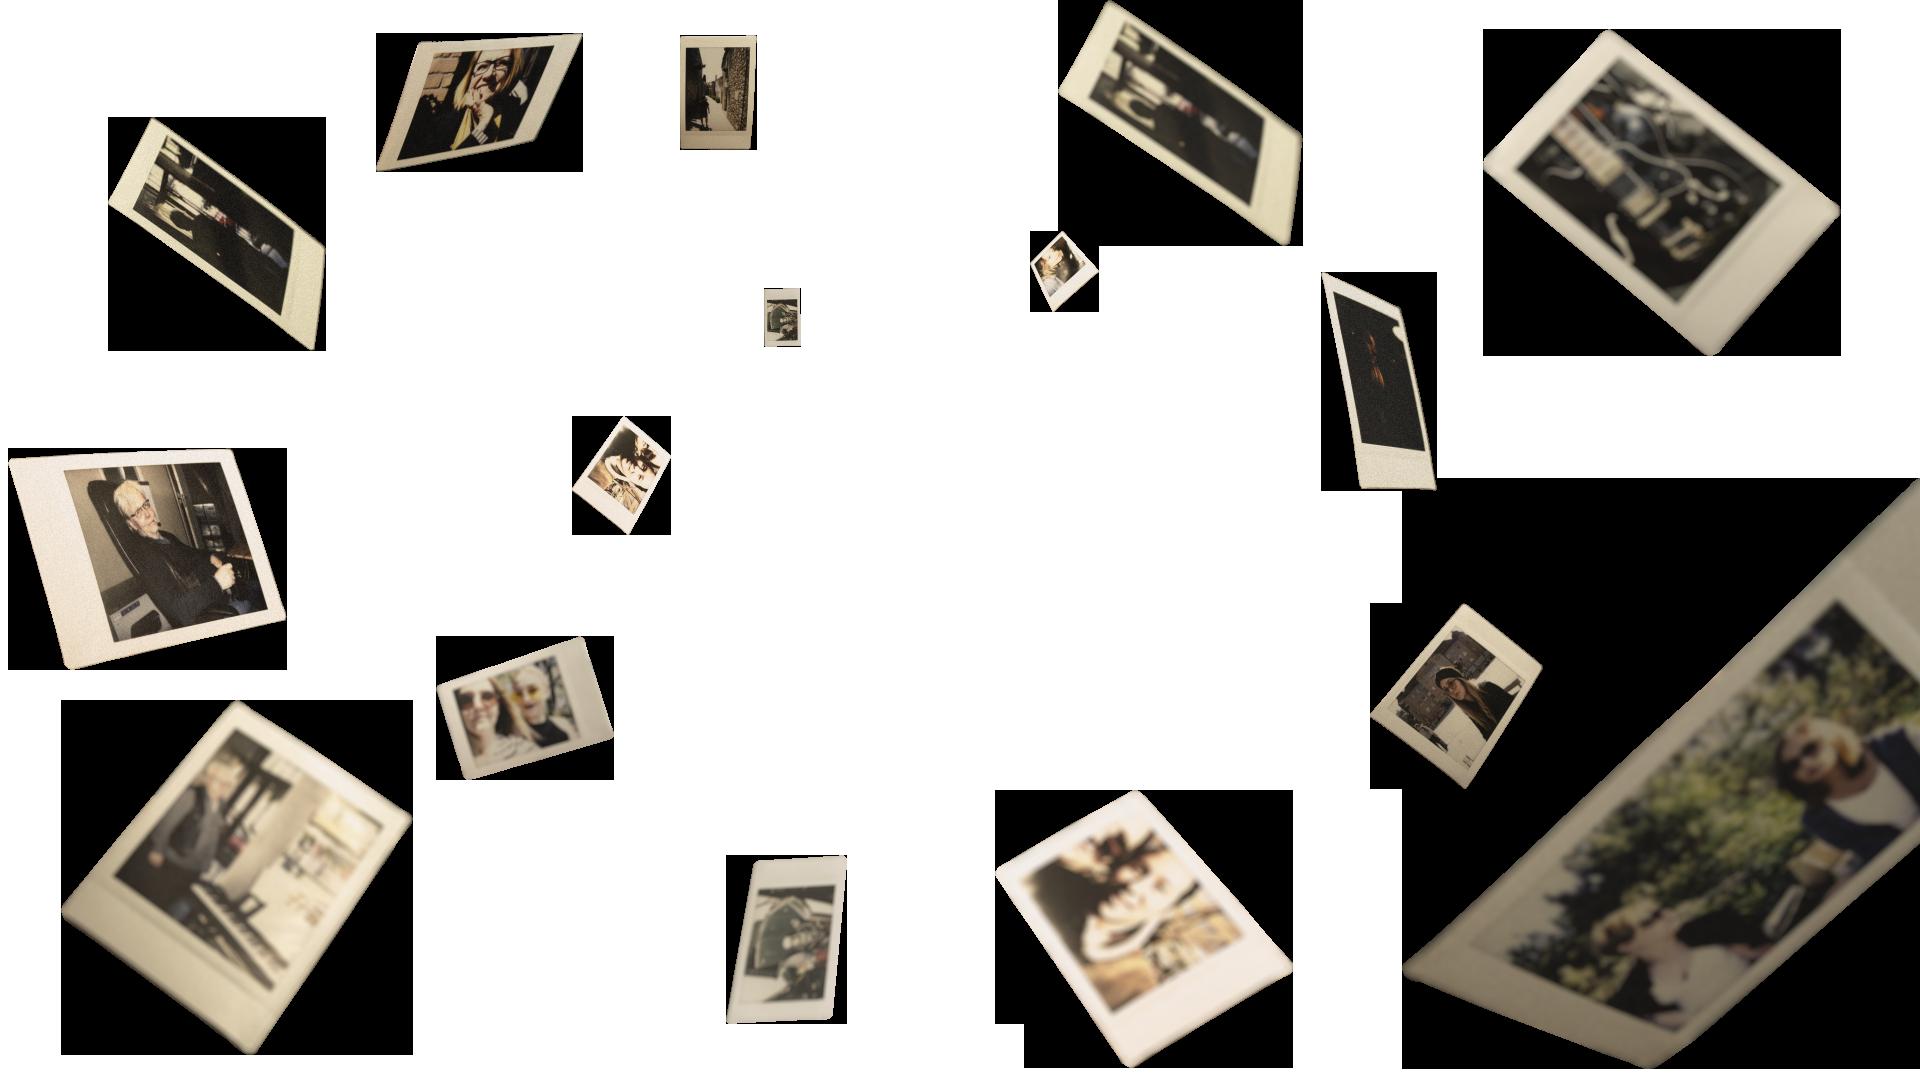 1920 x 1080 polaroids omarrangerad